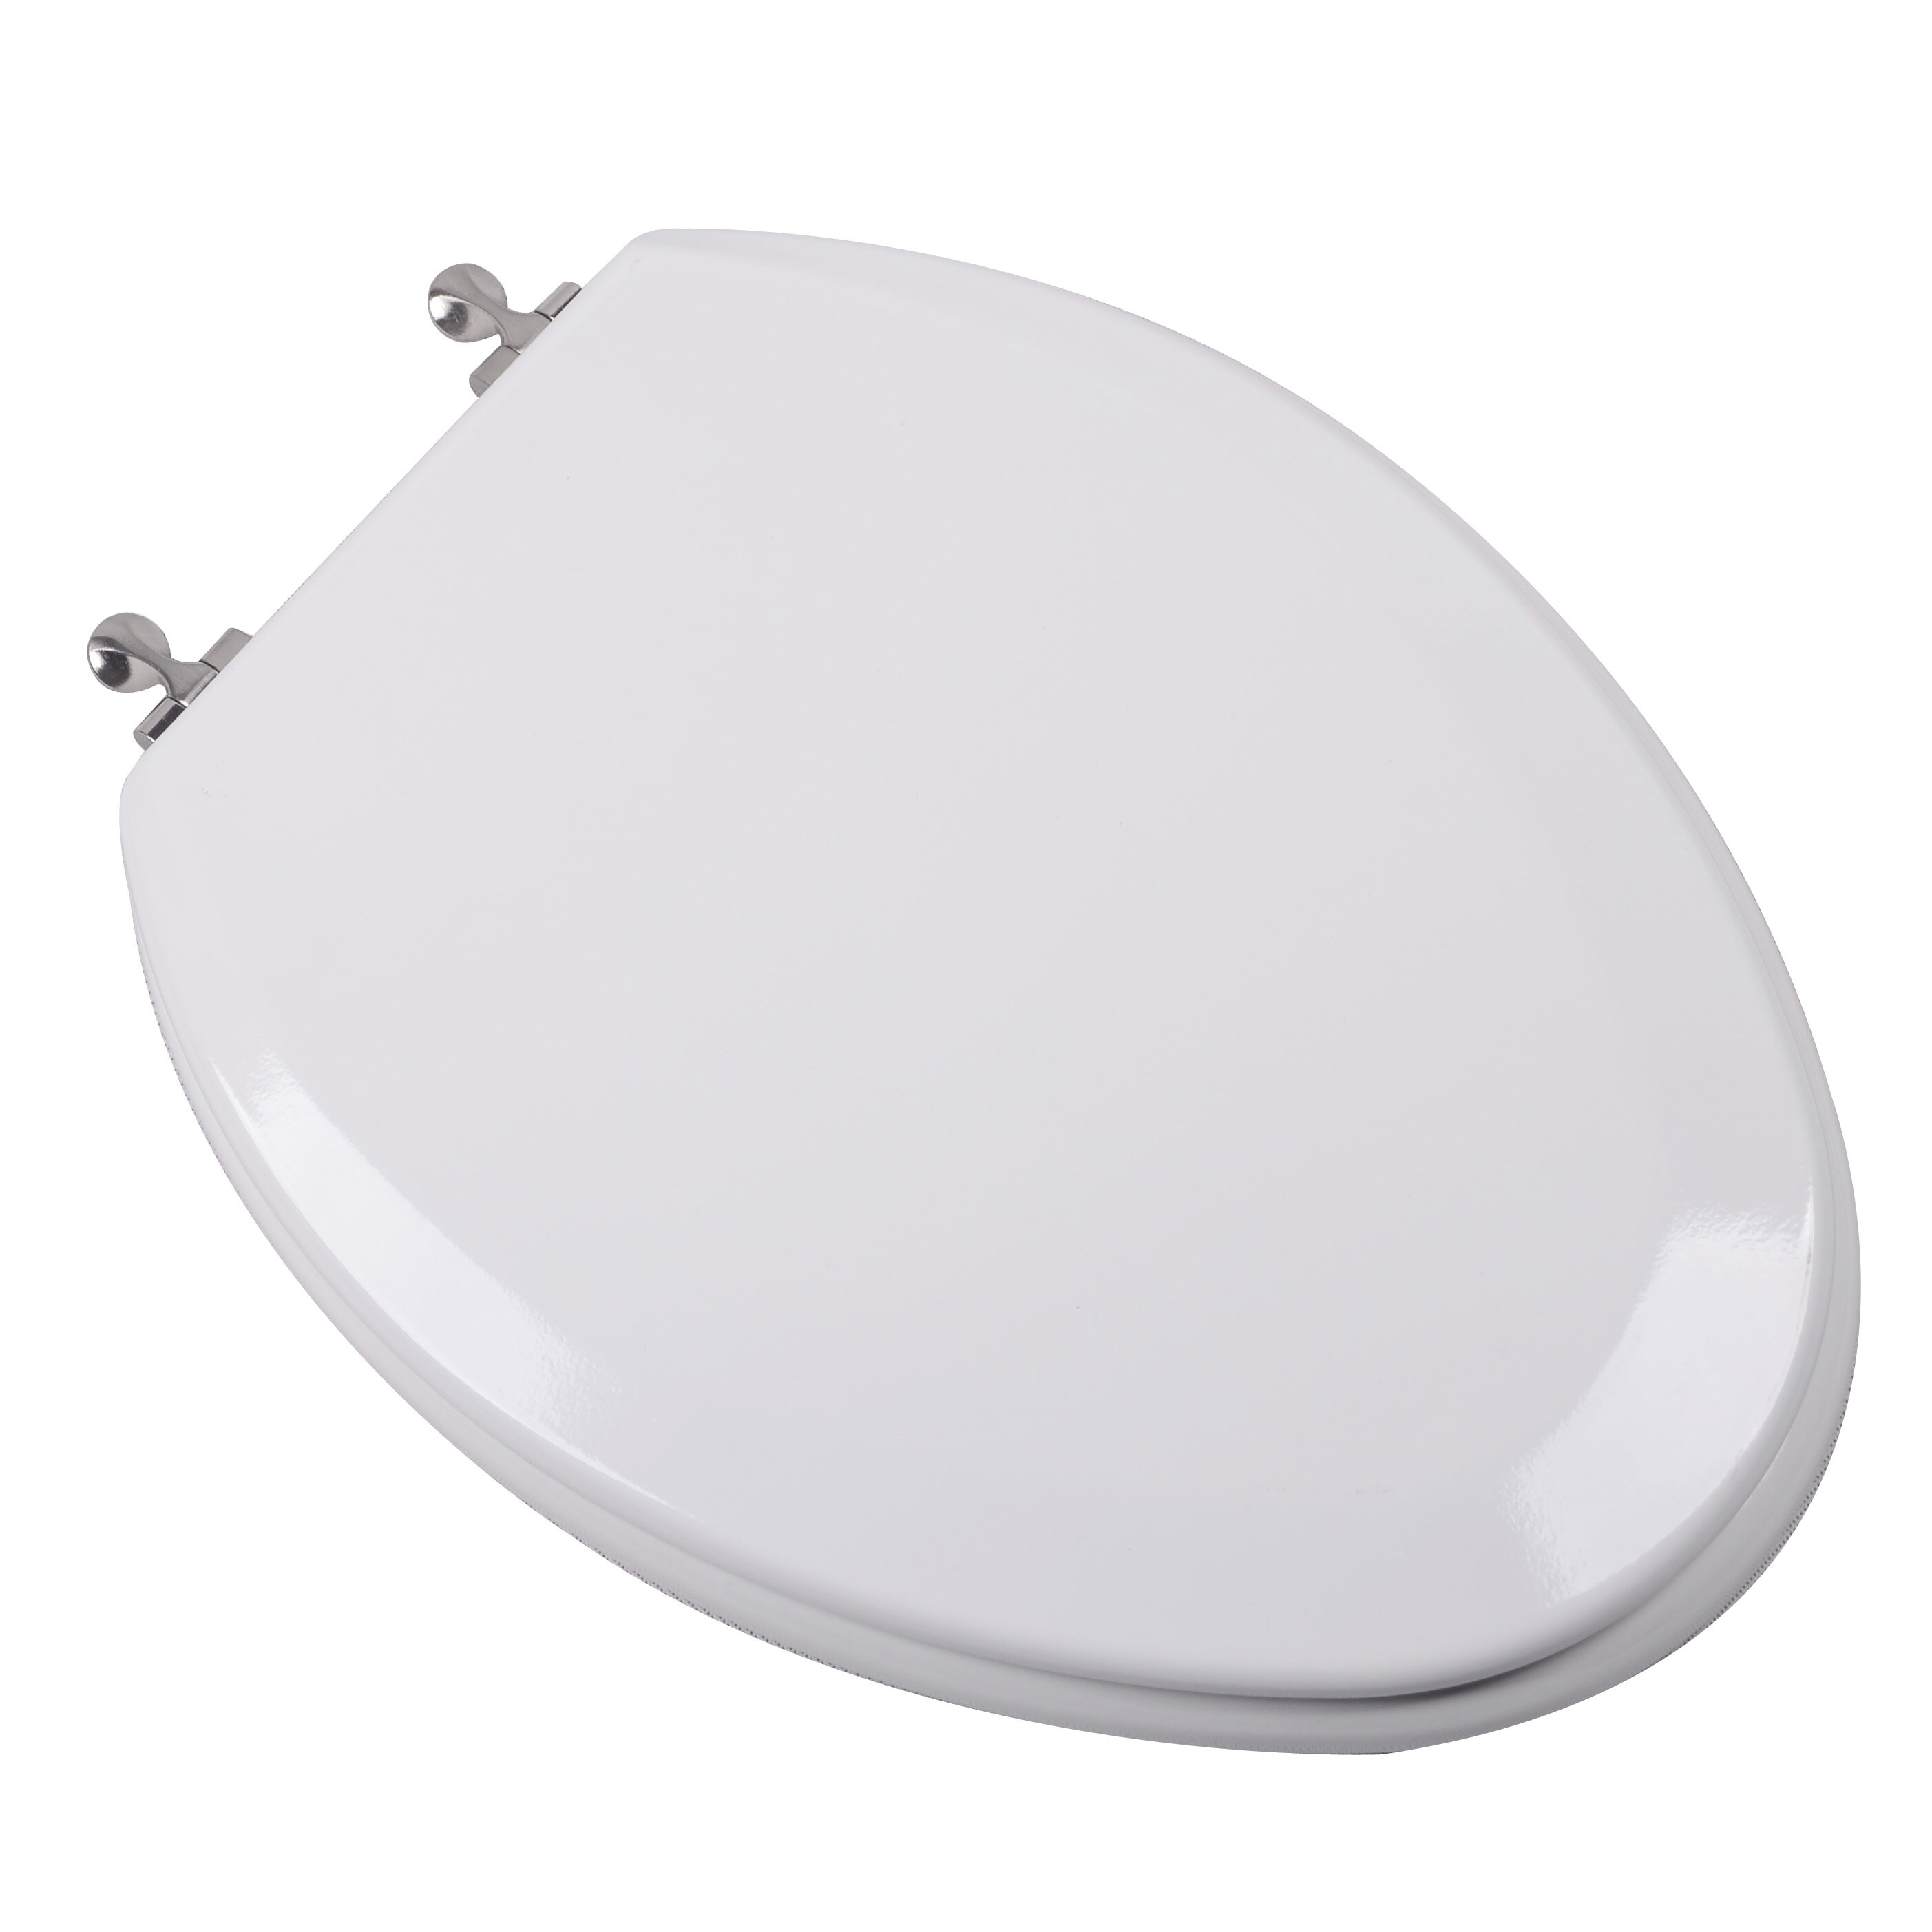 Plumbingtechnologiesllc Premium Molded Wood Elongated Toilet Seat Wayfair